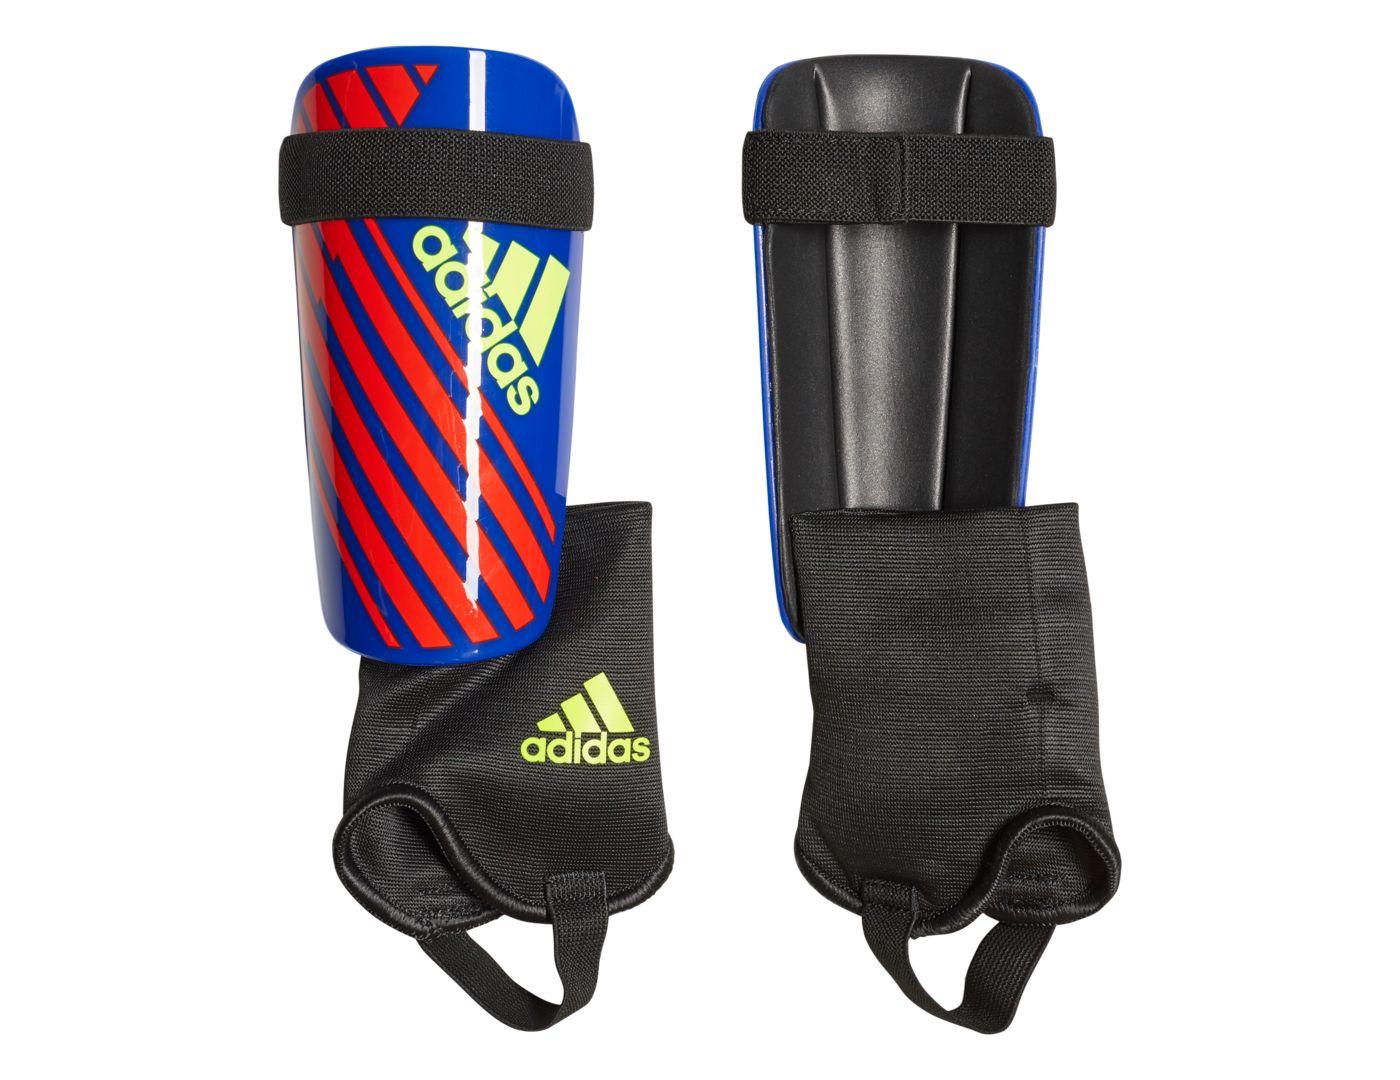 adidas Adult X Club Soccer Shin Guards